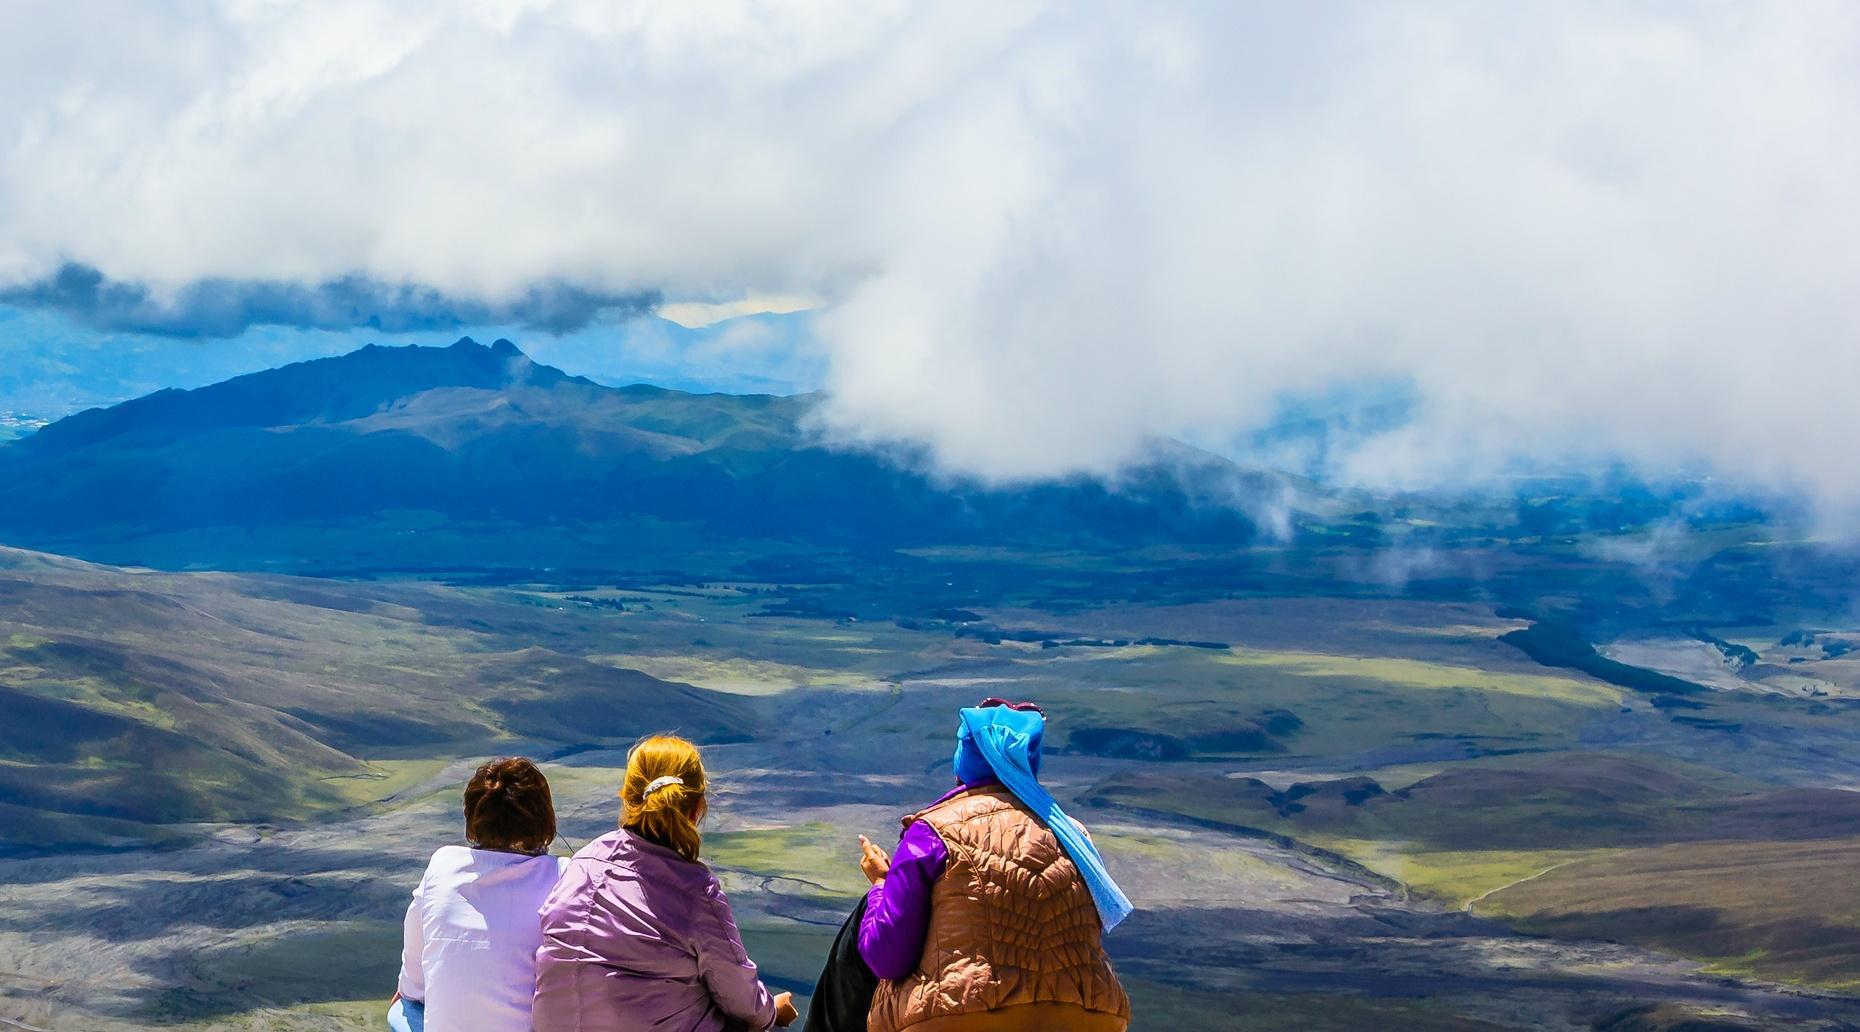 Cotopaxi National Park Hiking & Biking Tour